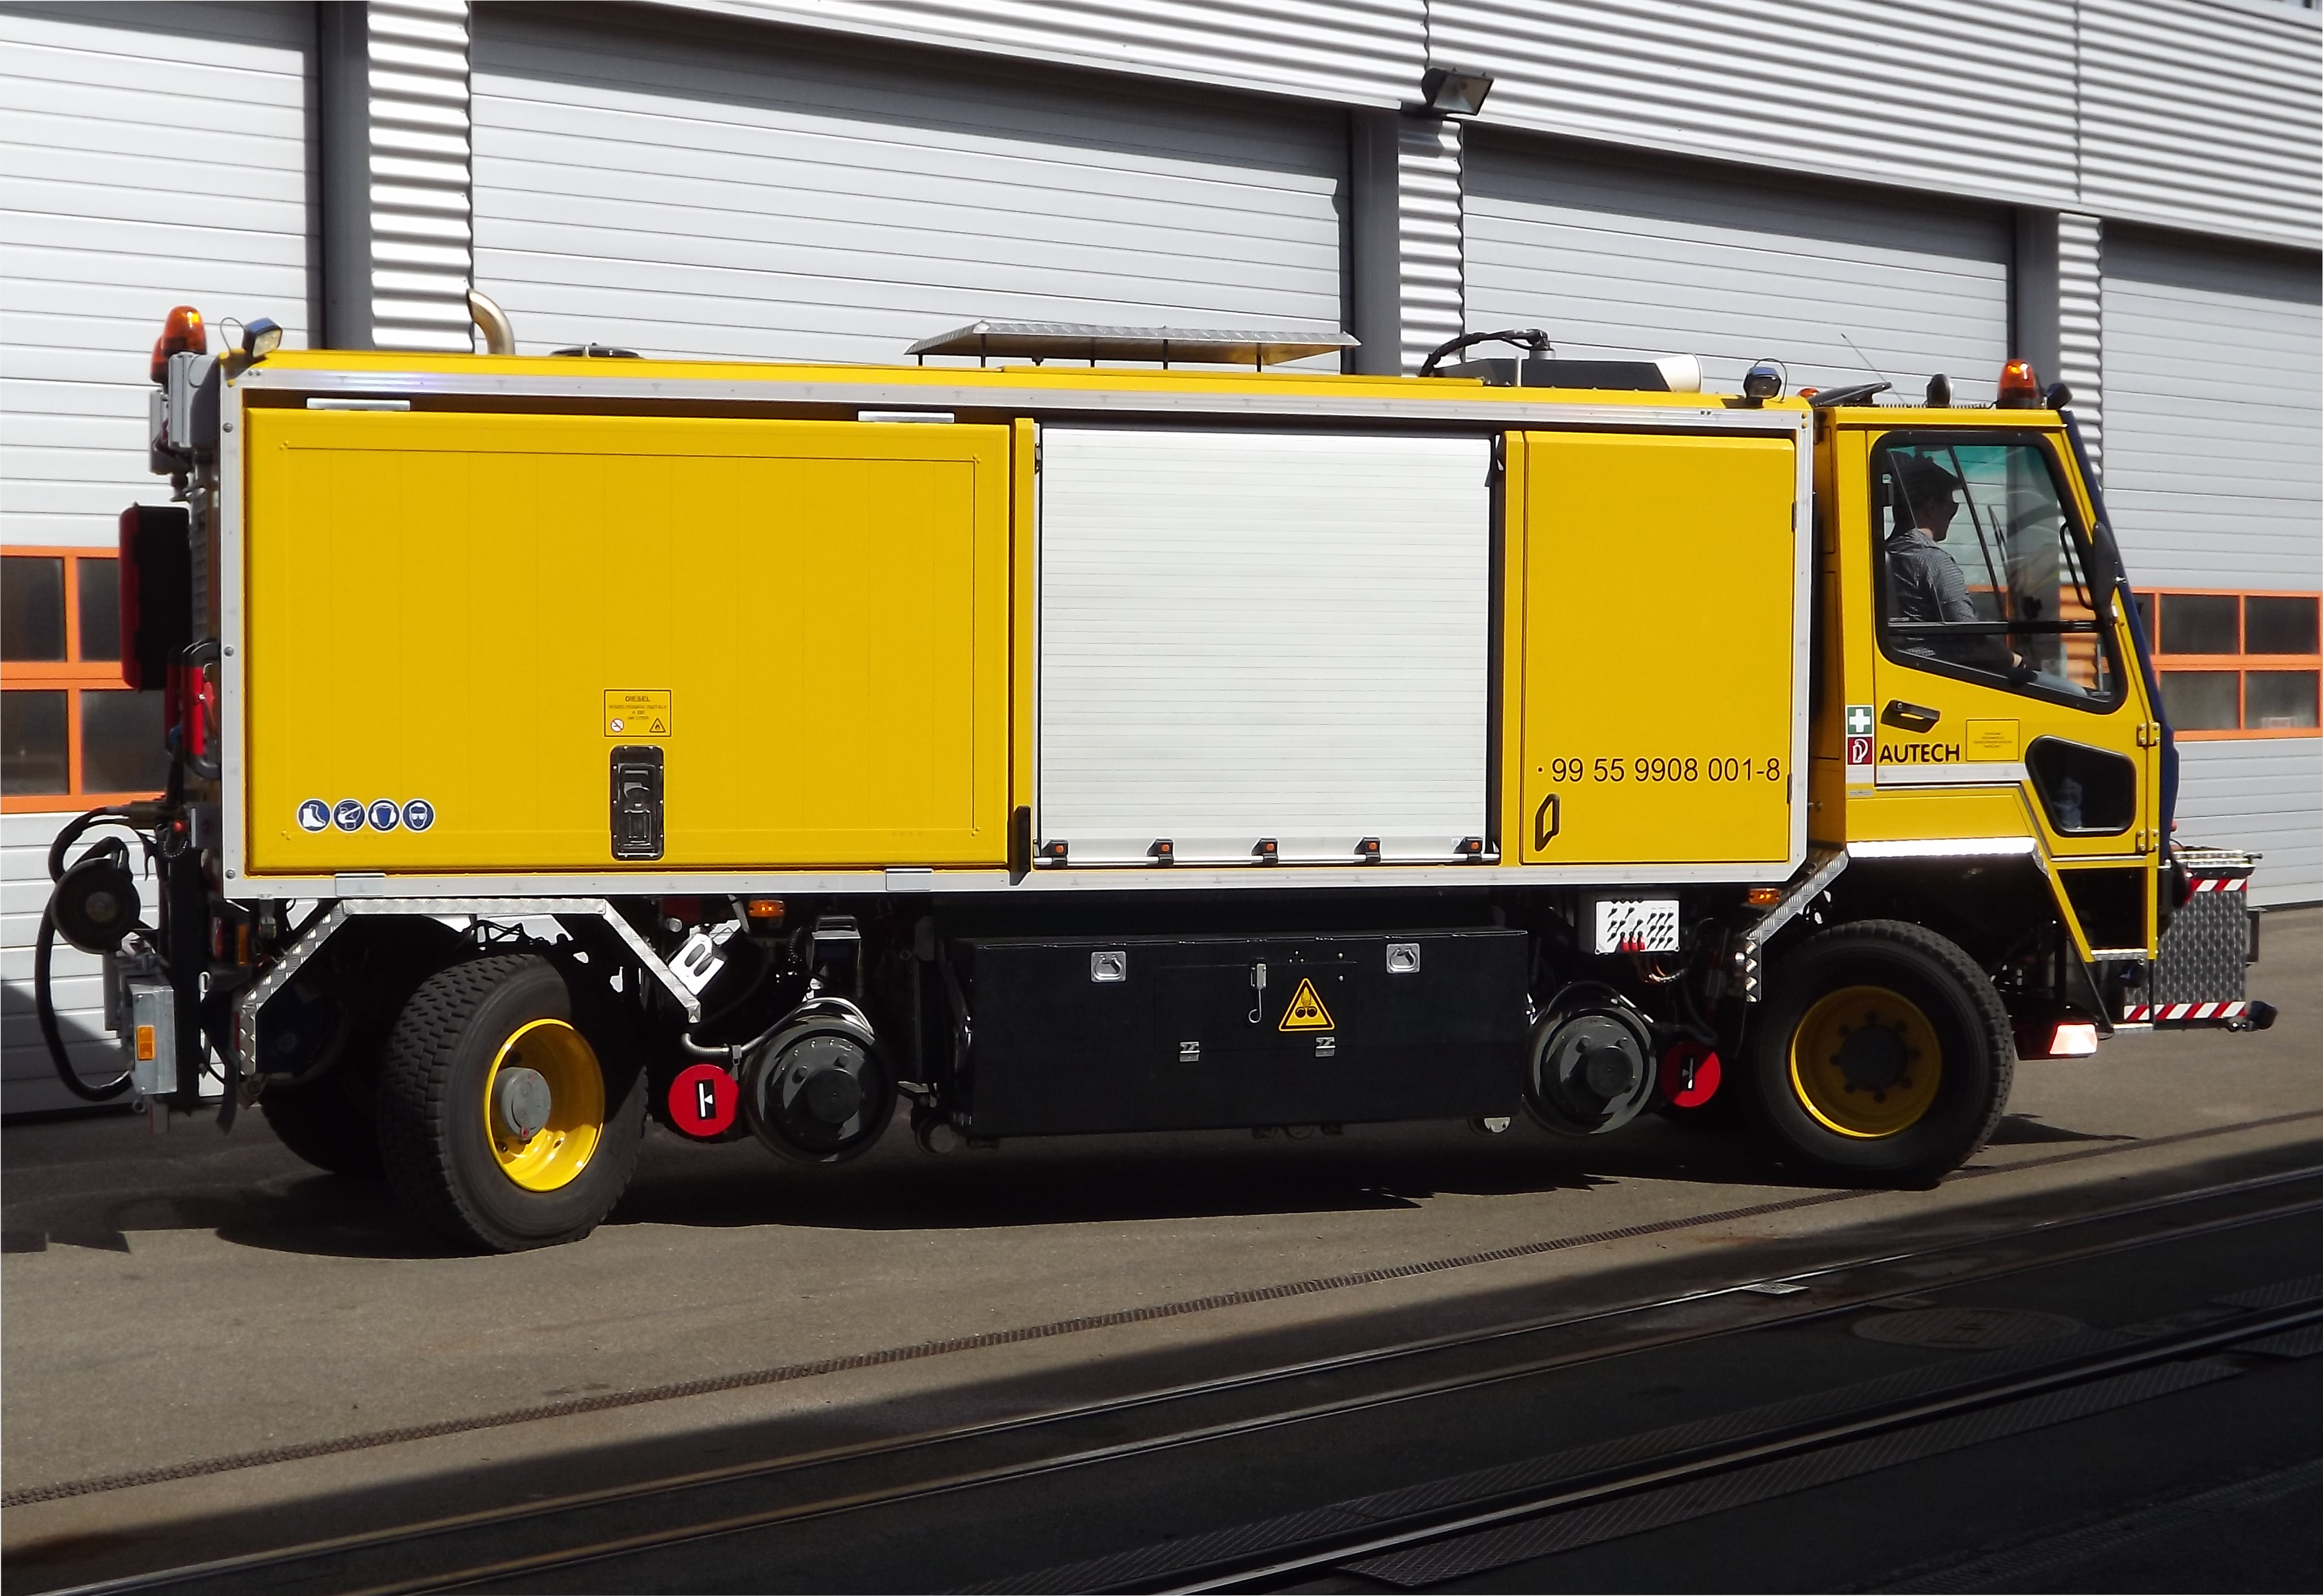 AT VM 8000-12E Two-way Rail Grinding Vehicle